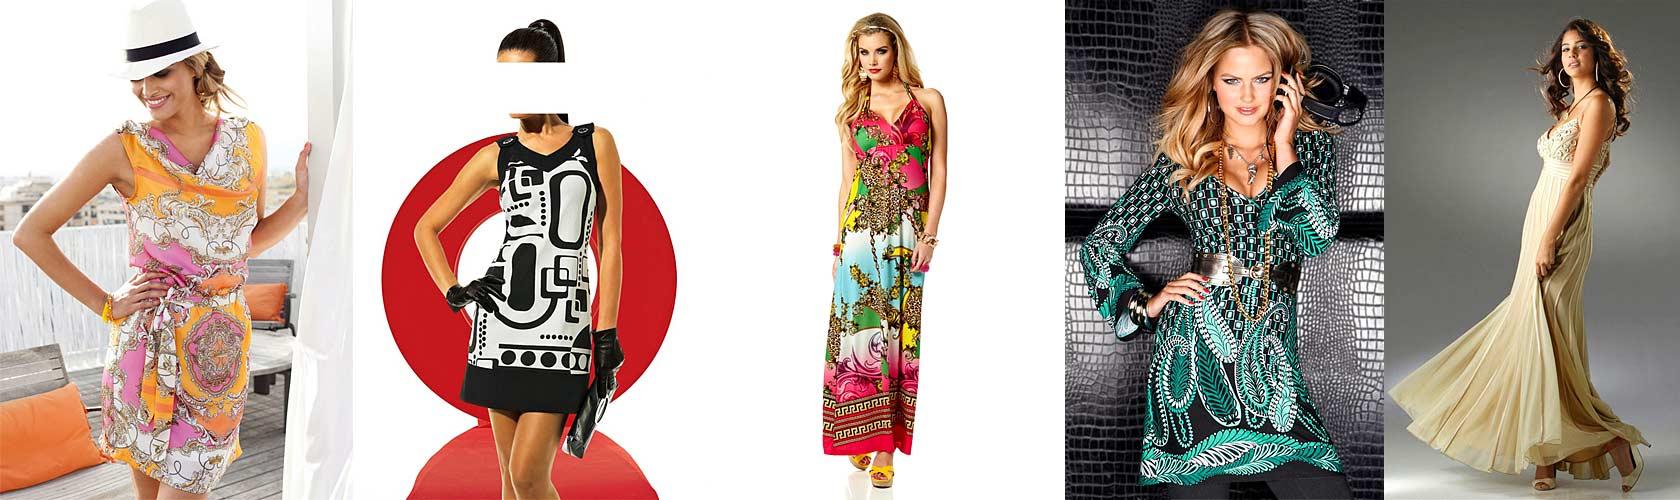 Mode Großhandel, Restposten Mode & Accessoires Kleidung ...